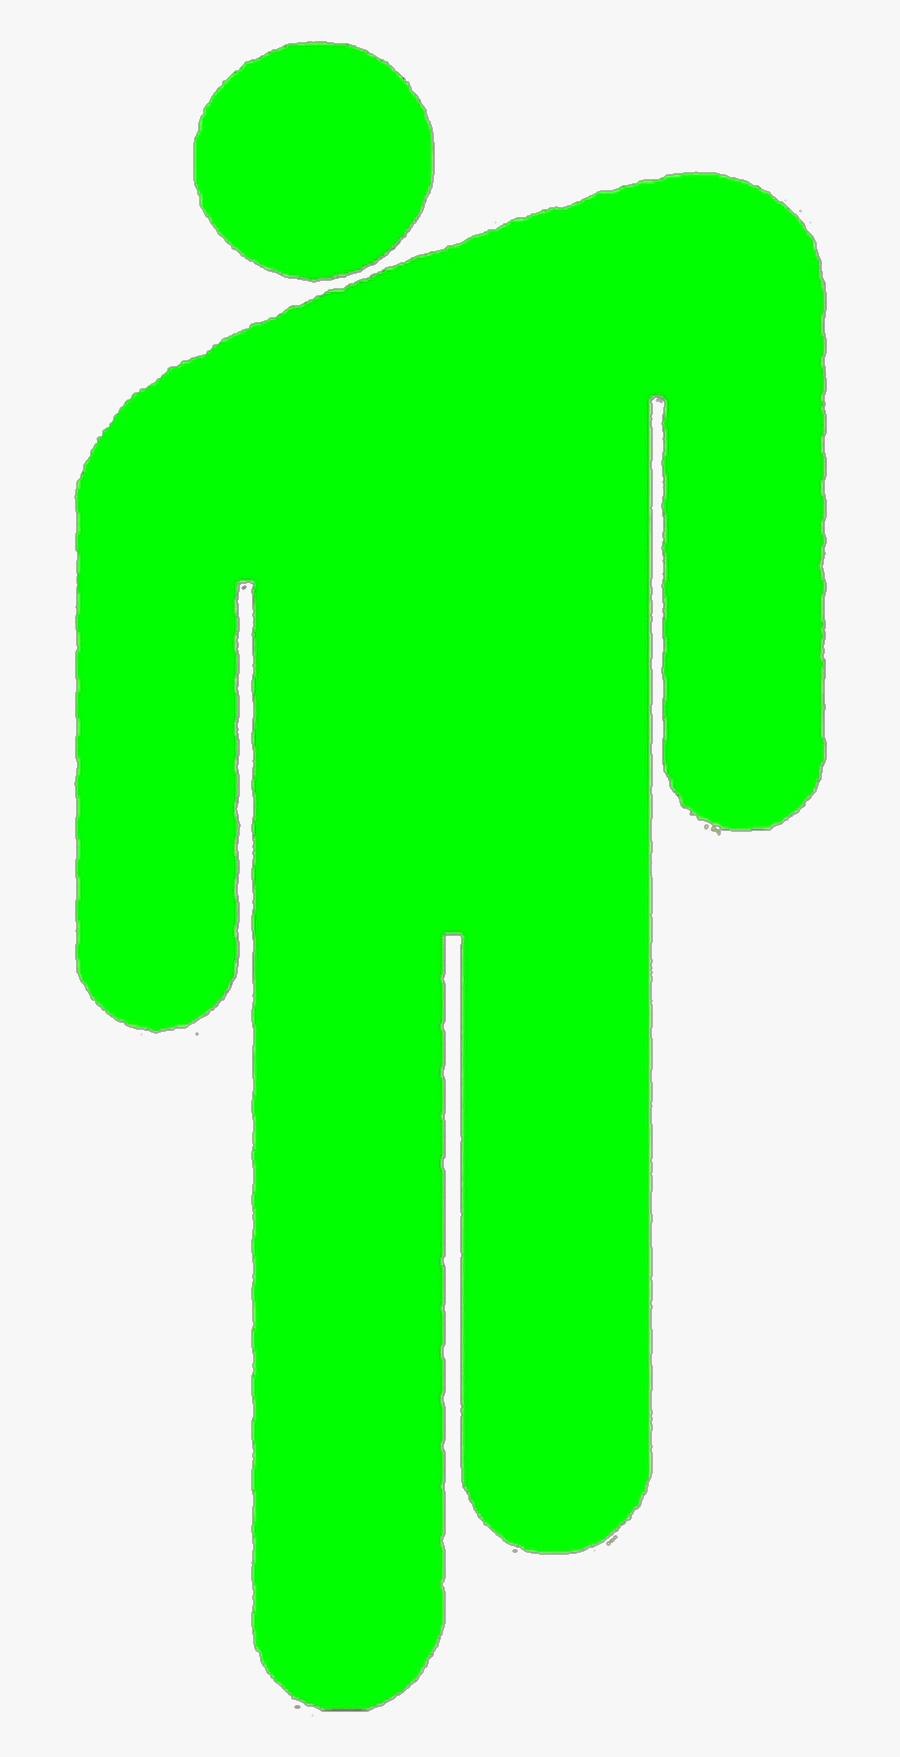 #blohsh #avocados #avocado #billie #eilish #billieeilish - Billie Eilish Logo Sticker, Transparent Clipart